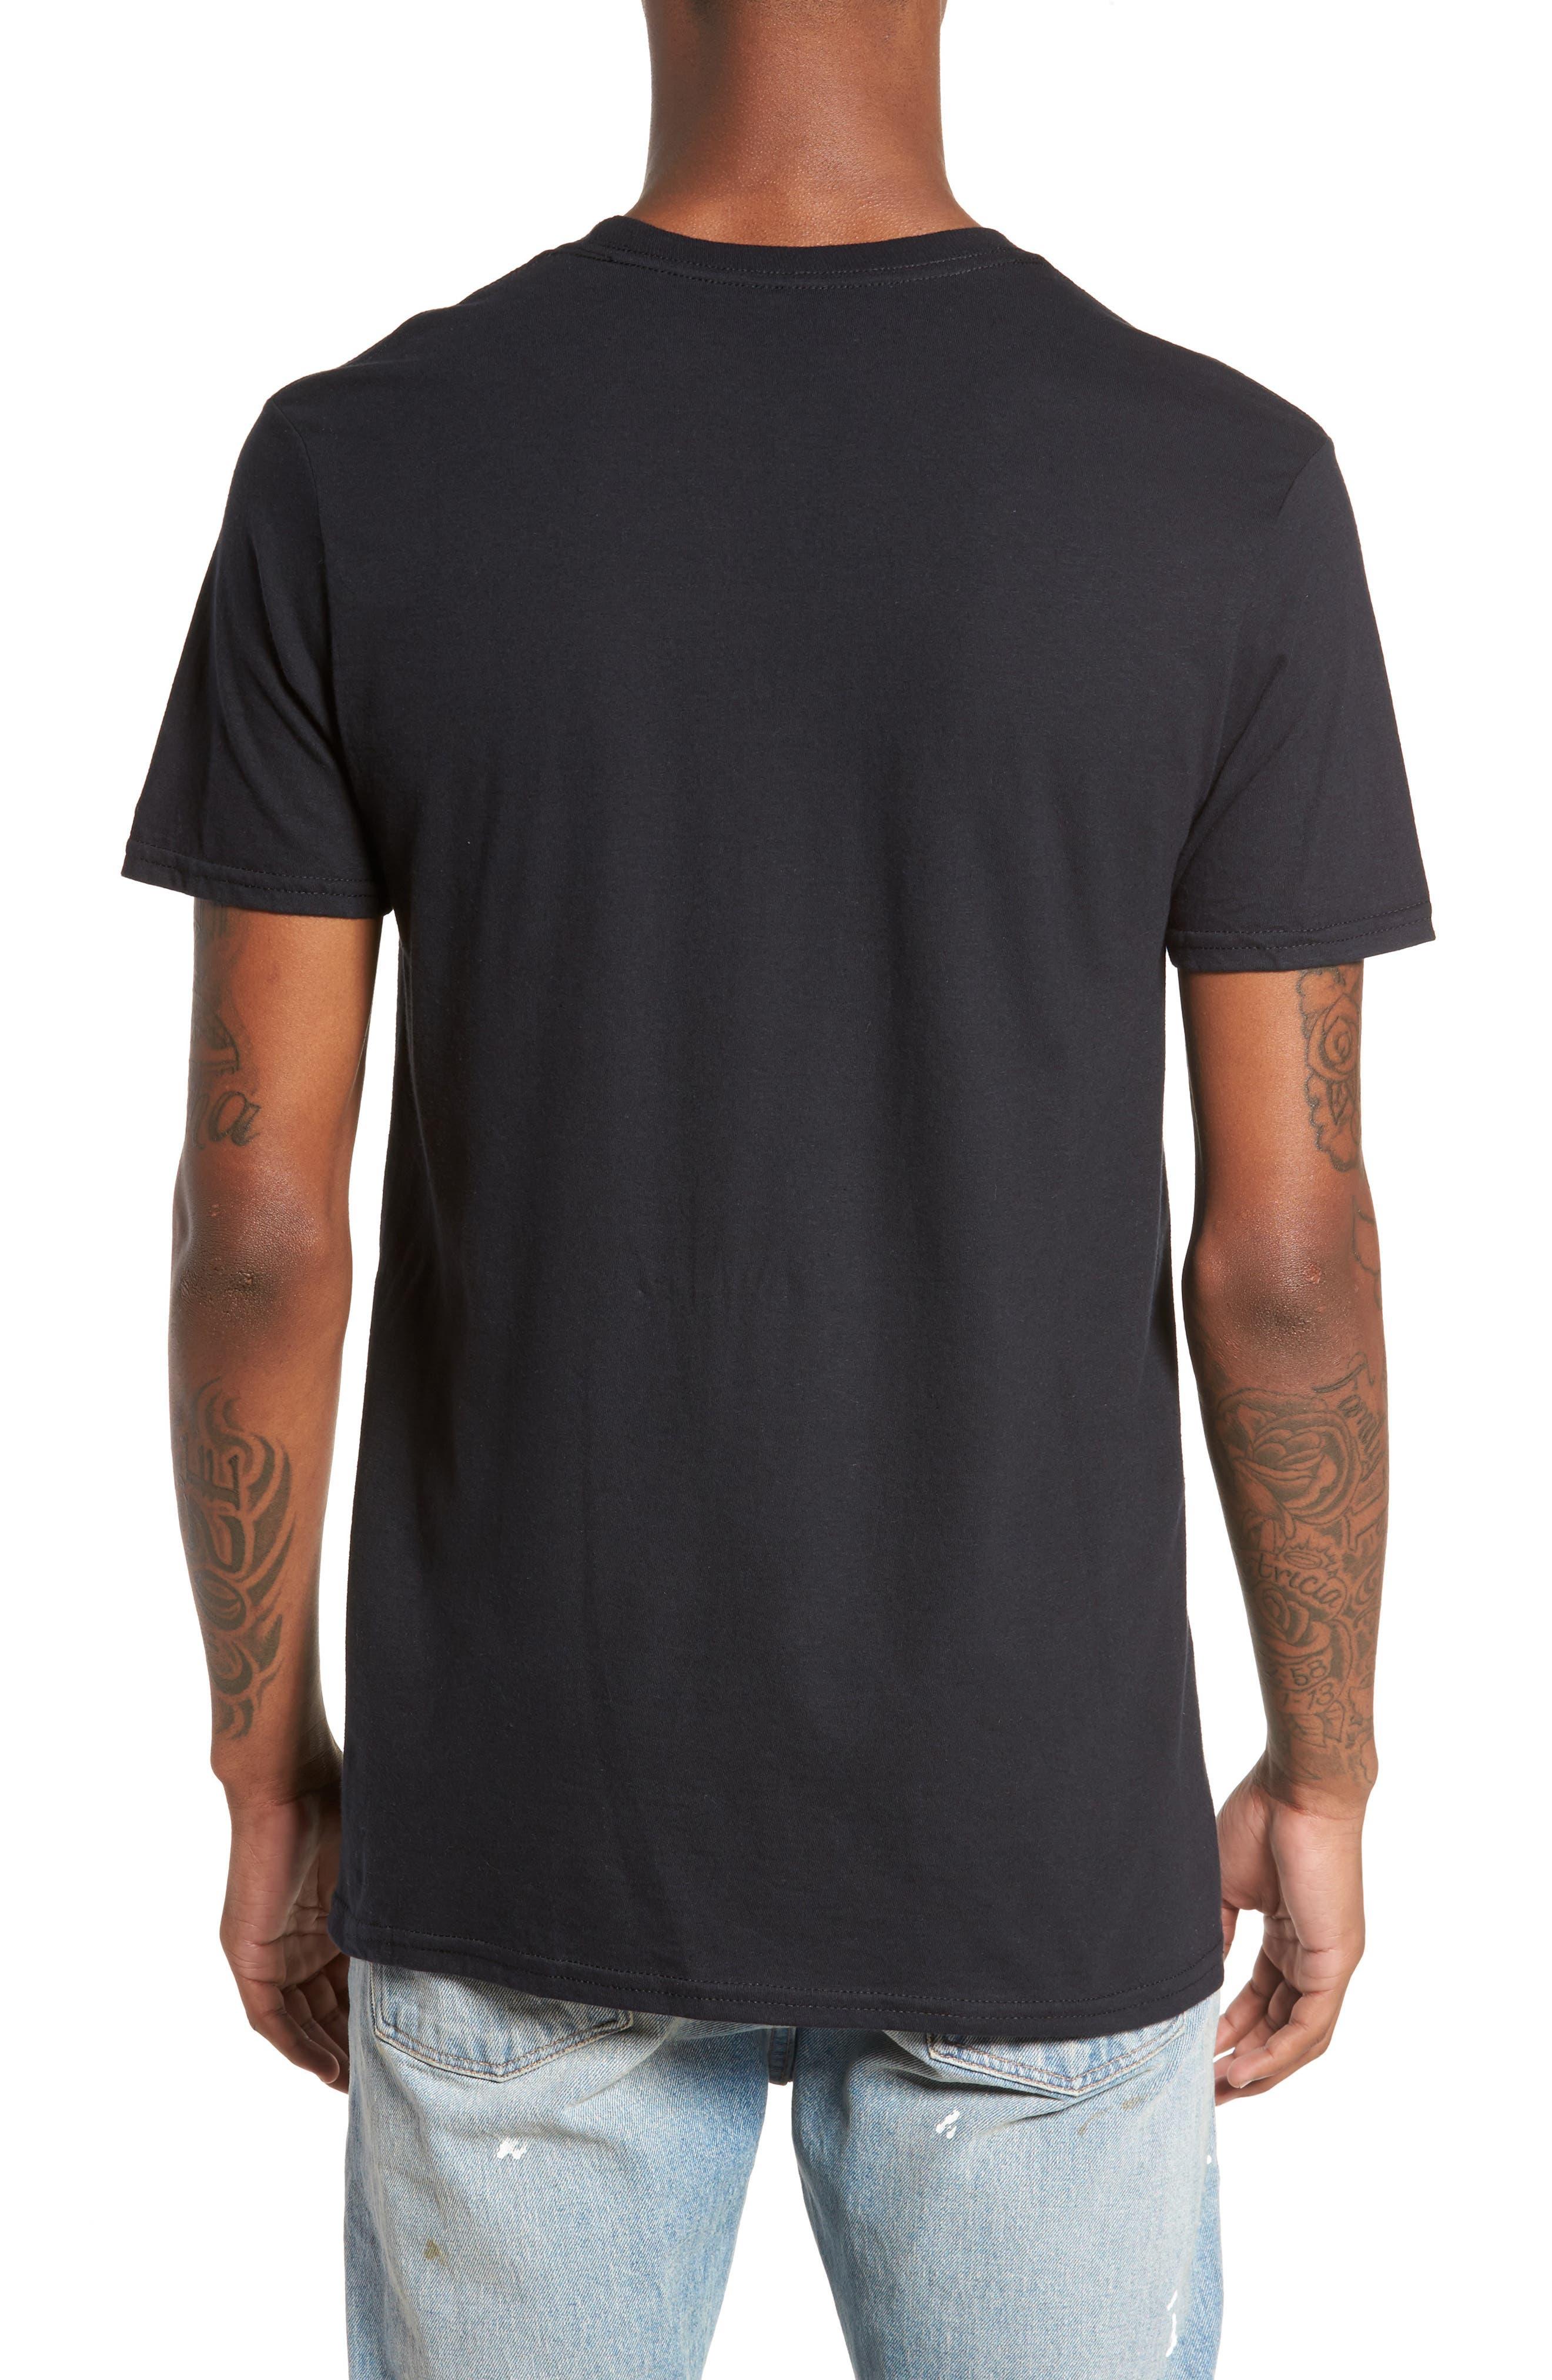 Digital Underground T-Shirt,                             Alternate thumbnail 2, color,                             001